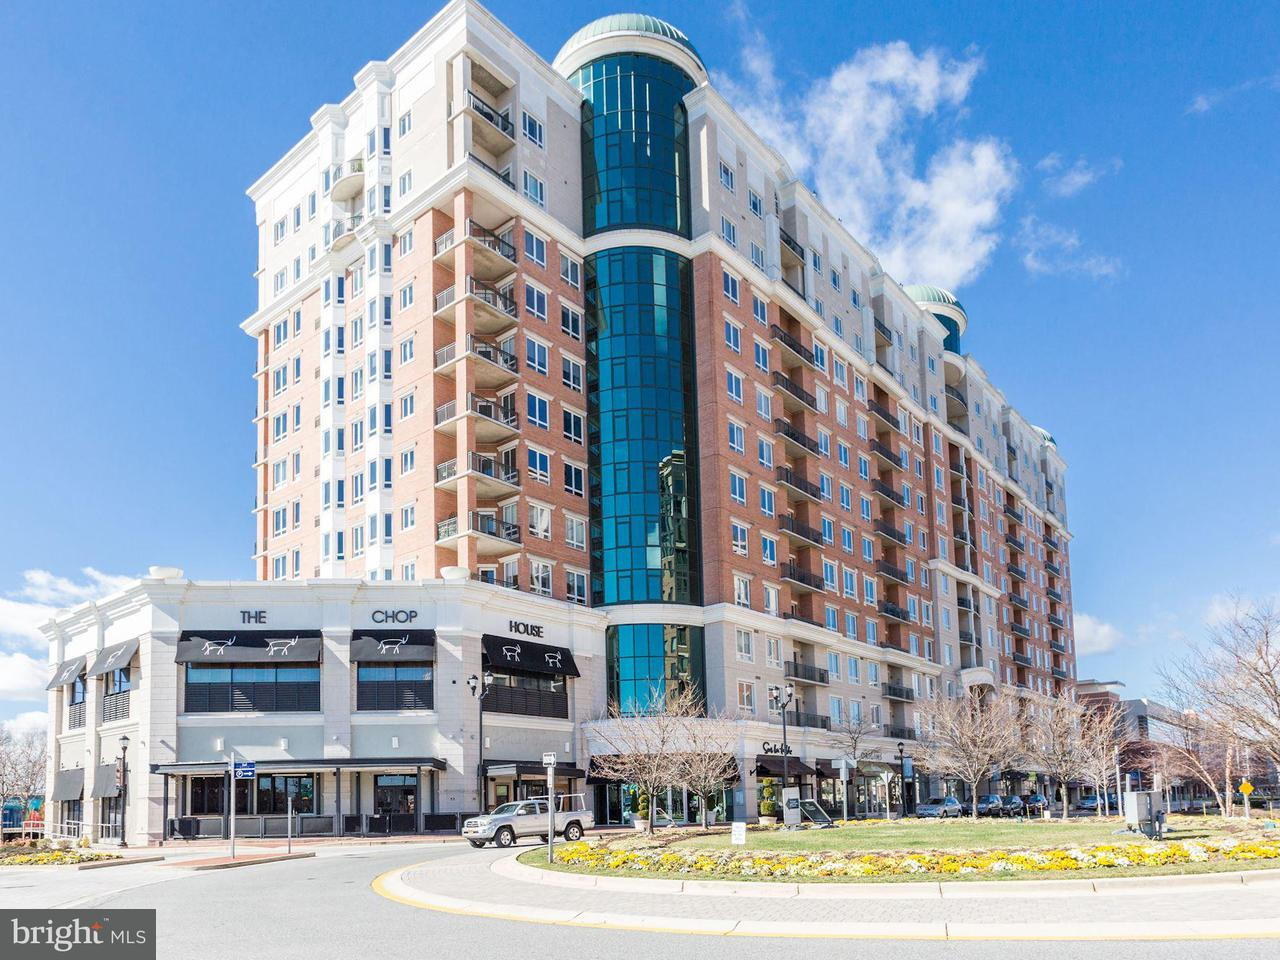 Condominium for Sale at 1915 Towne Centre Blvd #203 1915 Towne Centre Blvd #203 Annapolis, Maryland 21401 United States